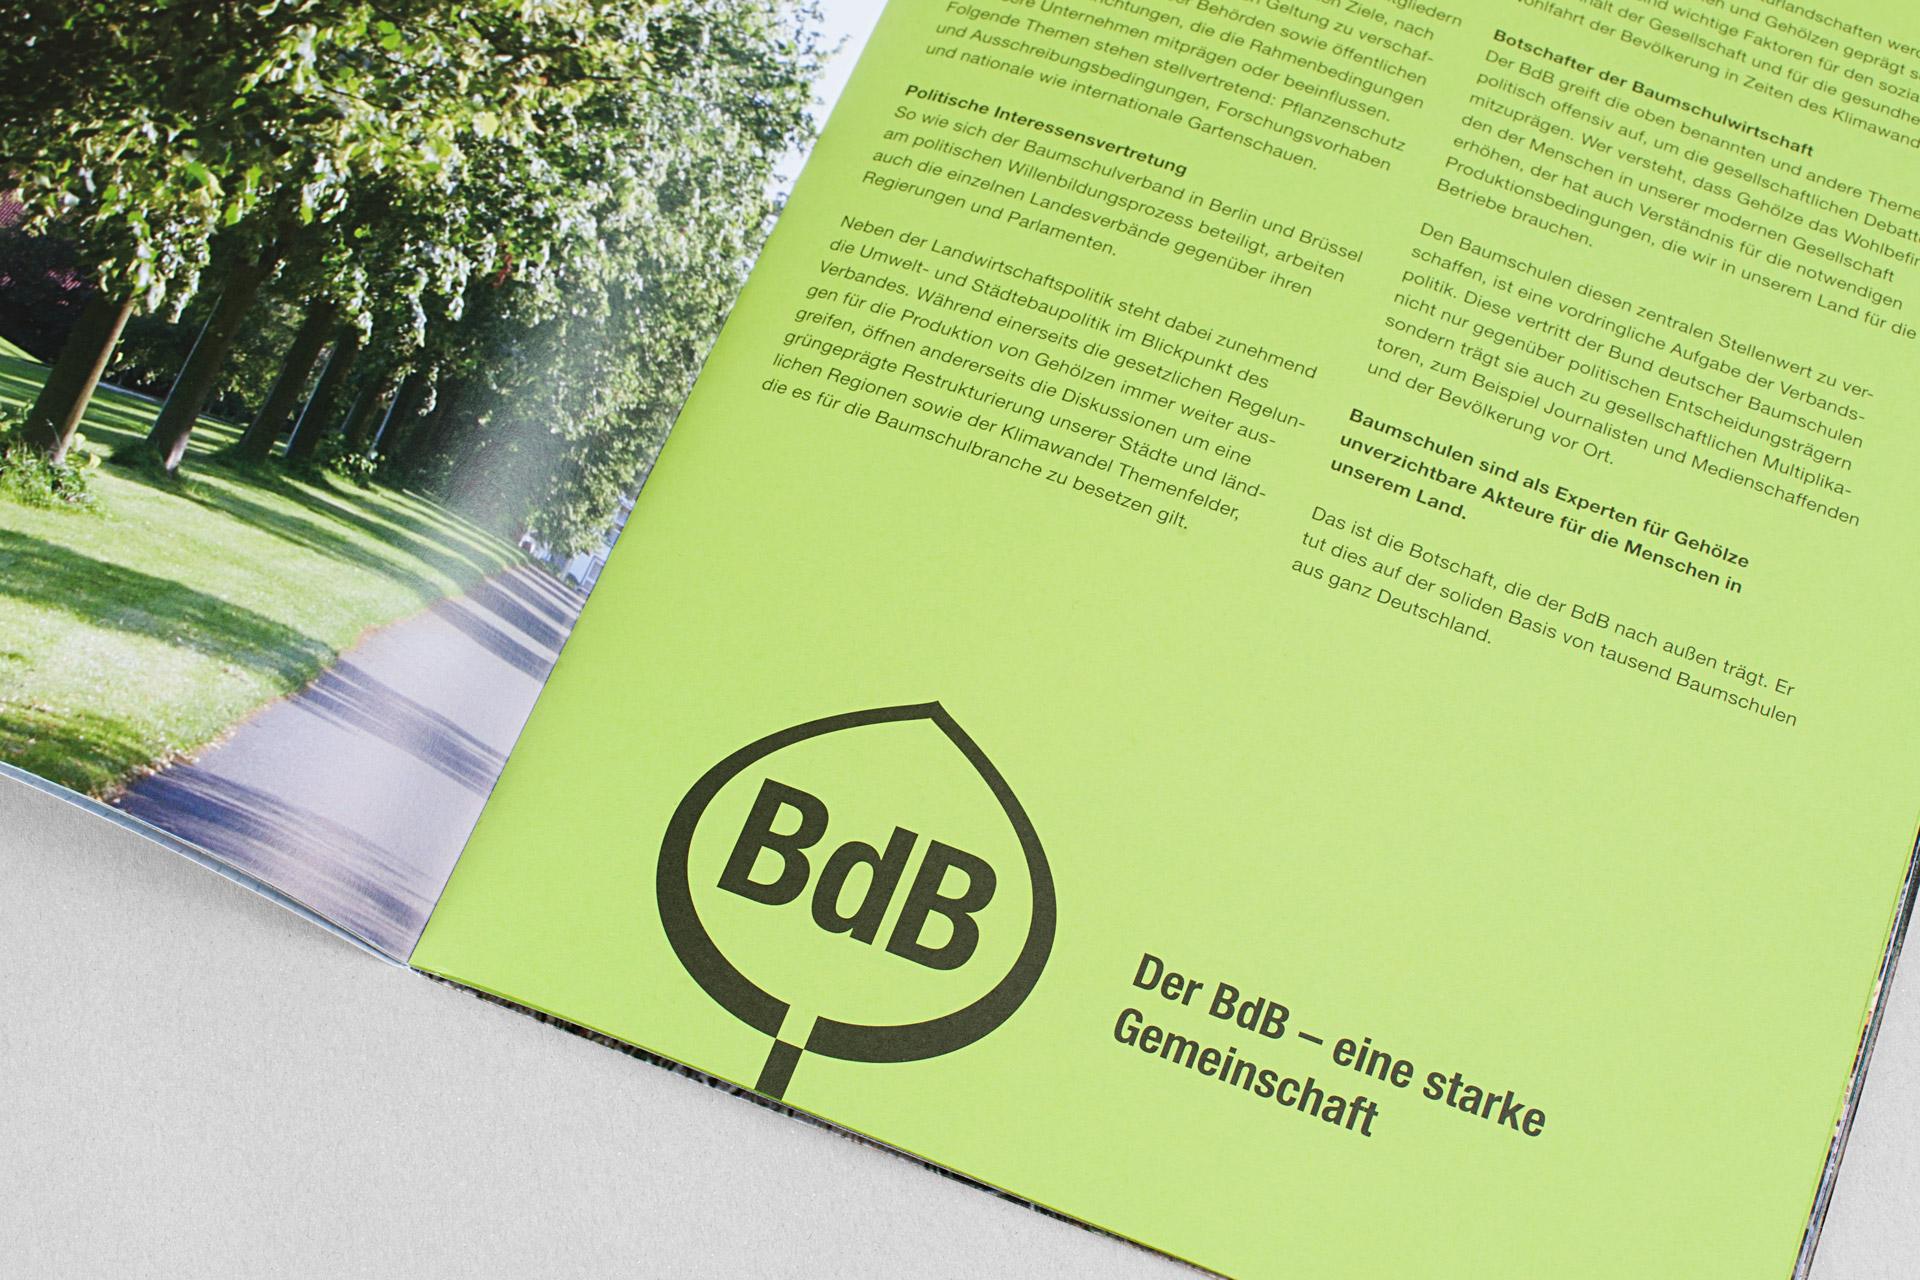 bdb-corporate-design broschuere design